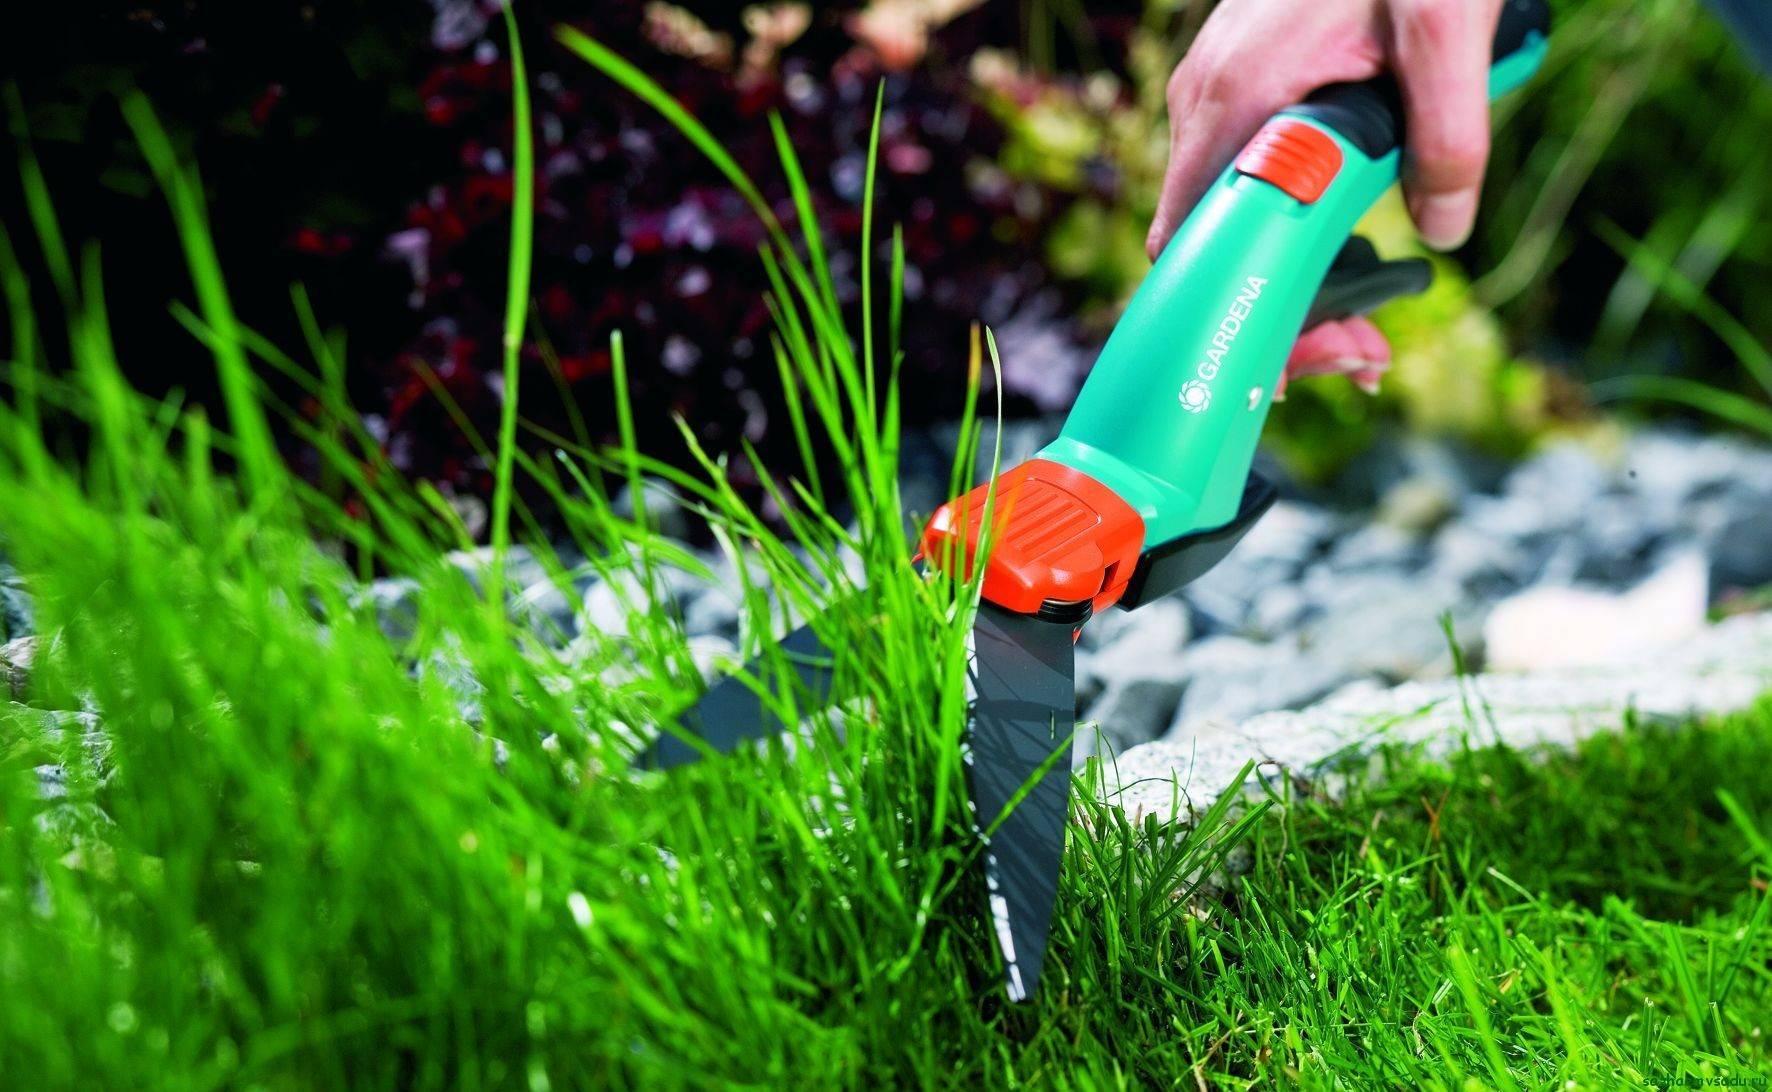 Уход за газоном: готовим почву, сеем, удобряем и стрижем